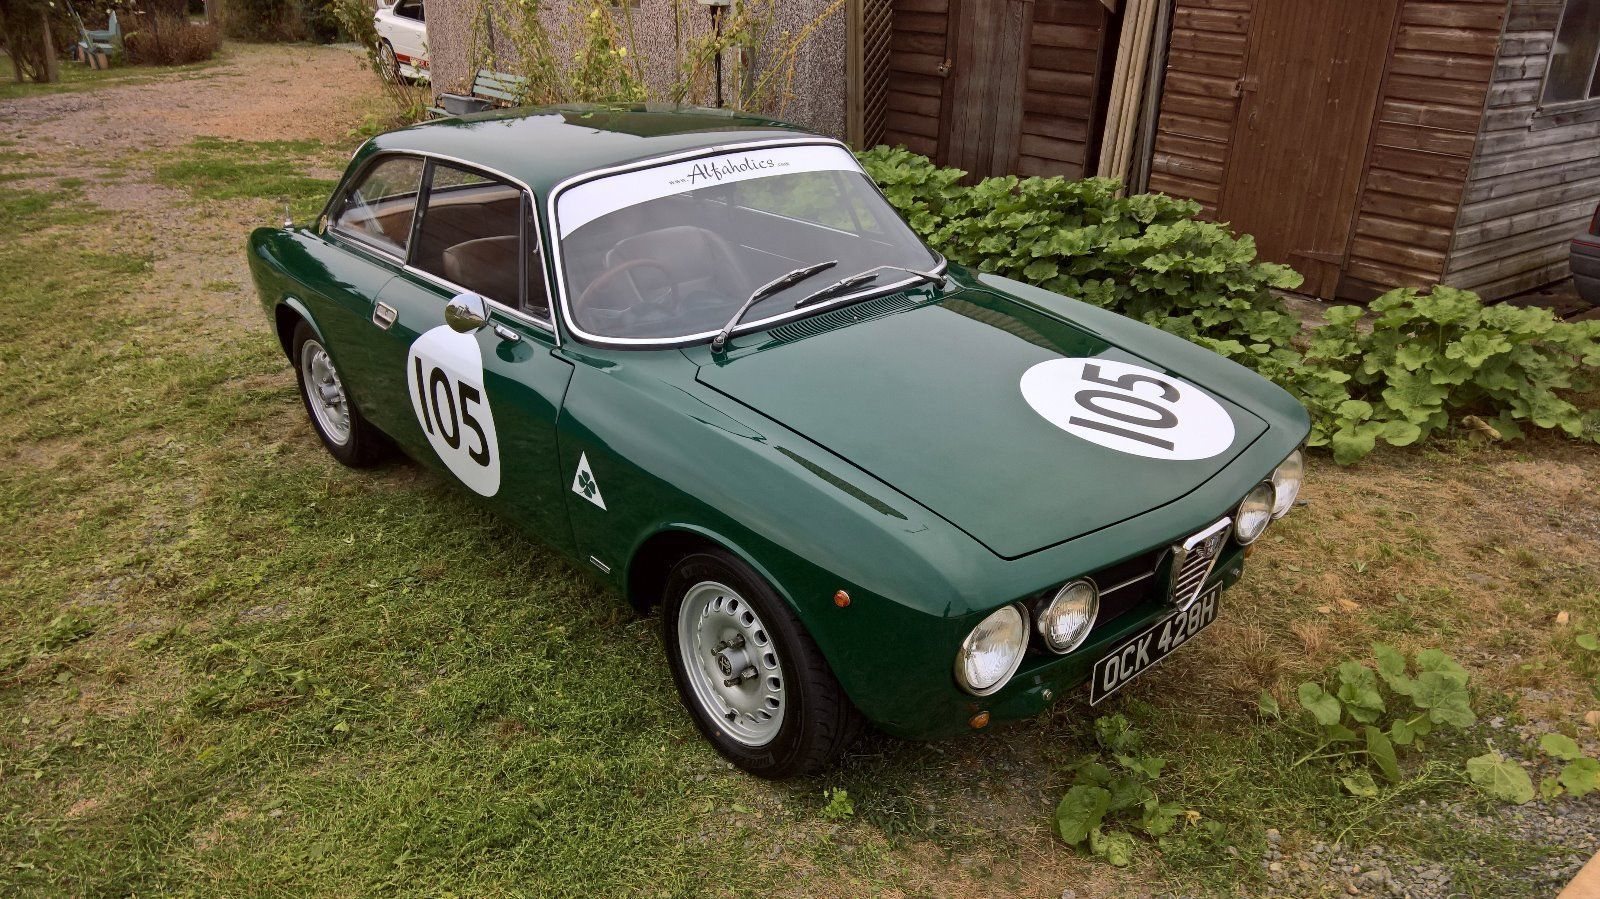 Alfa romeo 1750 gtv car classics - 1970 Alfa Romeo 1750 Gtv In Cars Motorcycles Vehicles Classic Cars Alfa